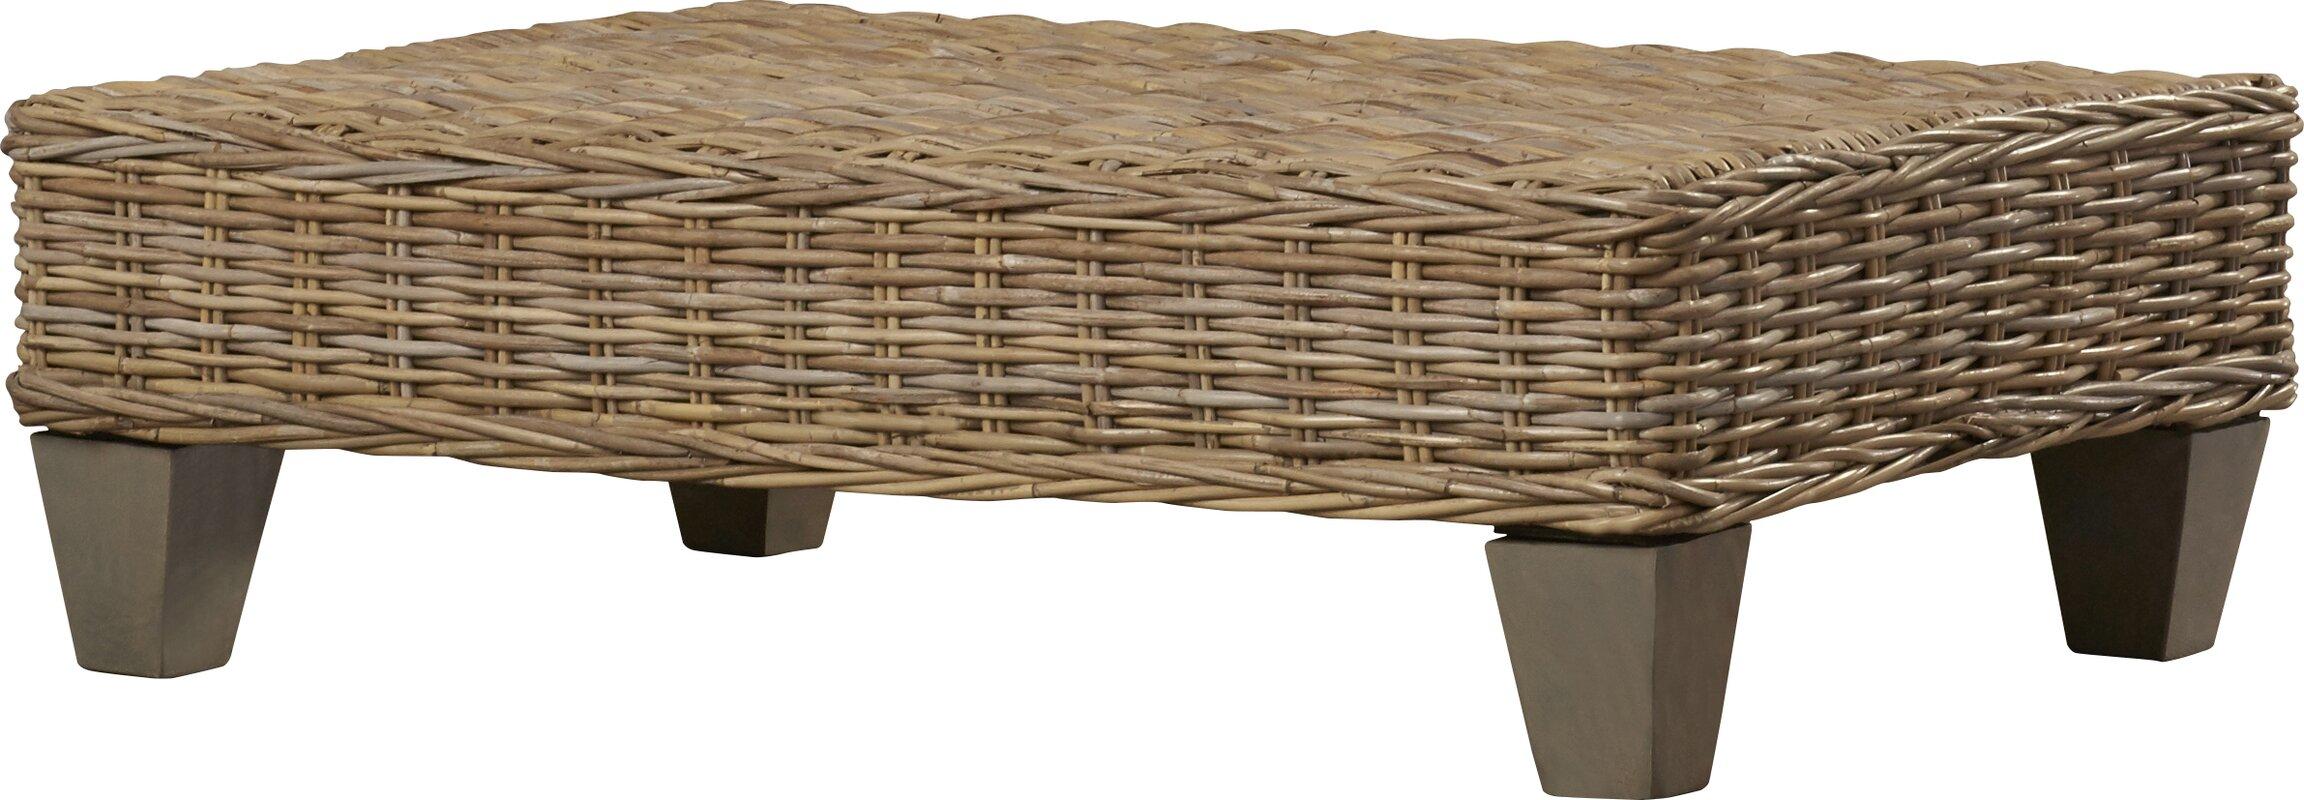 Nobleboro Wood Bench Brwt1814 on Mudroom Laundry Room Bo